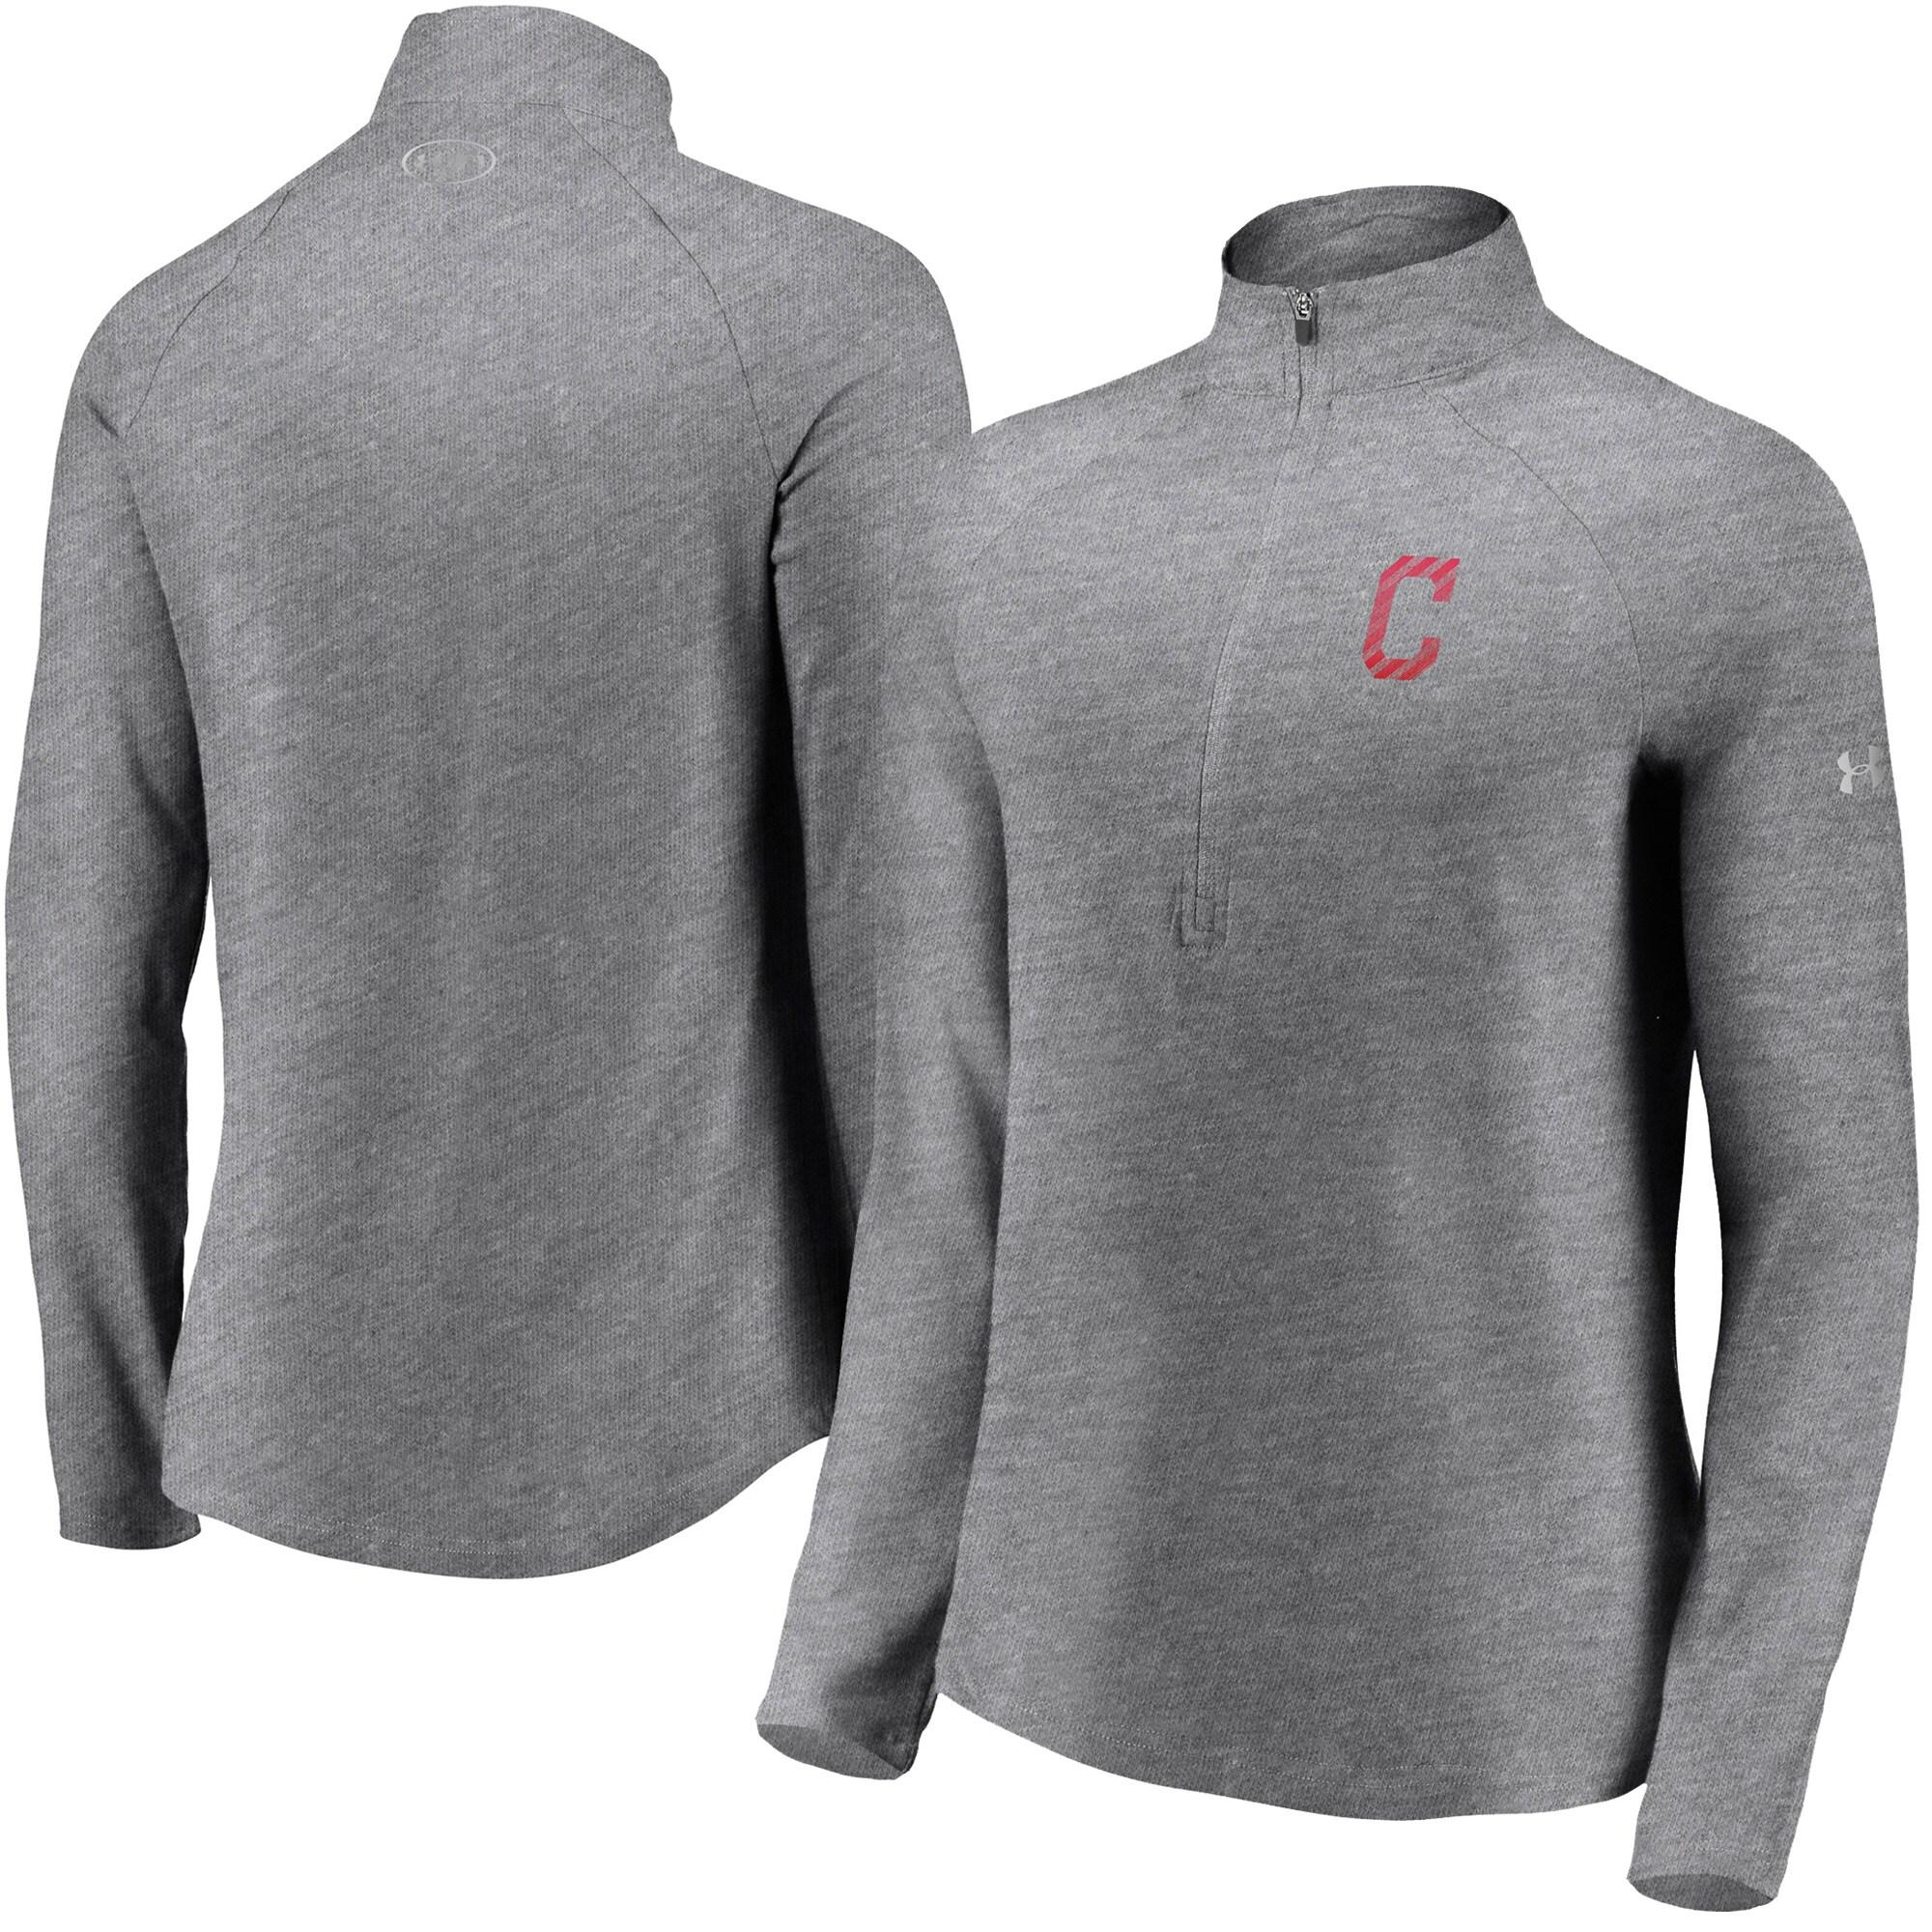 Cleveland Indians Under Armour Women's Passion Alternate Performance Tri-Blend Raglan Half-Zip Pullover Jacket - Heathered Gray